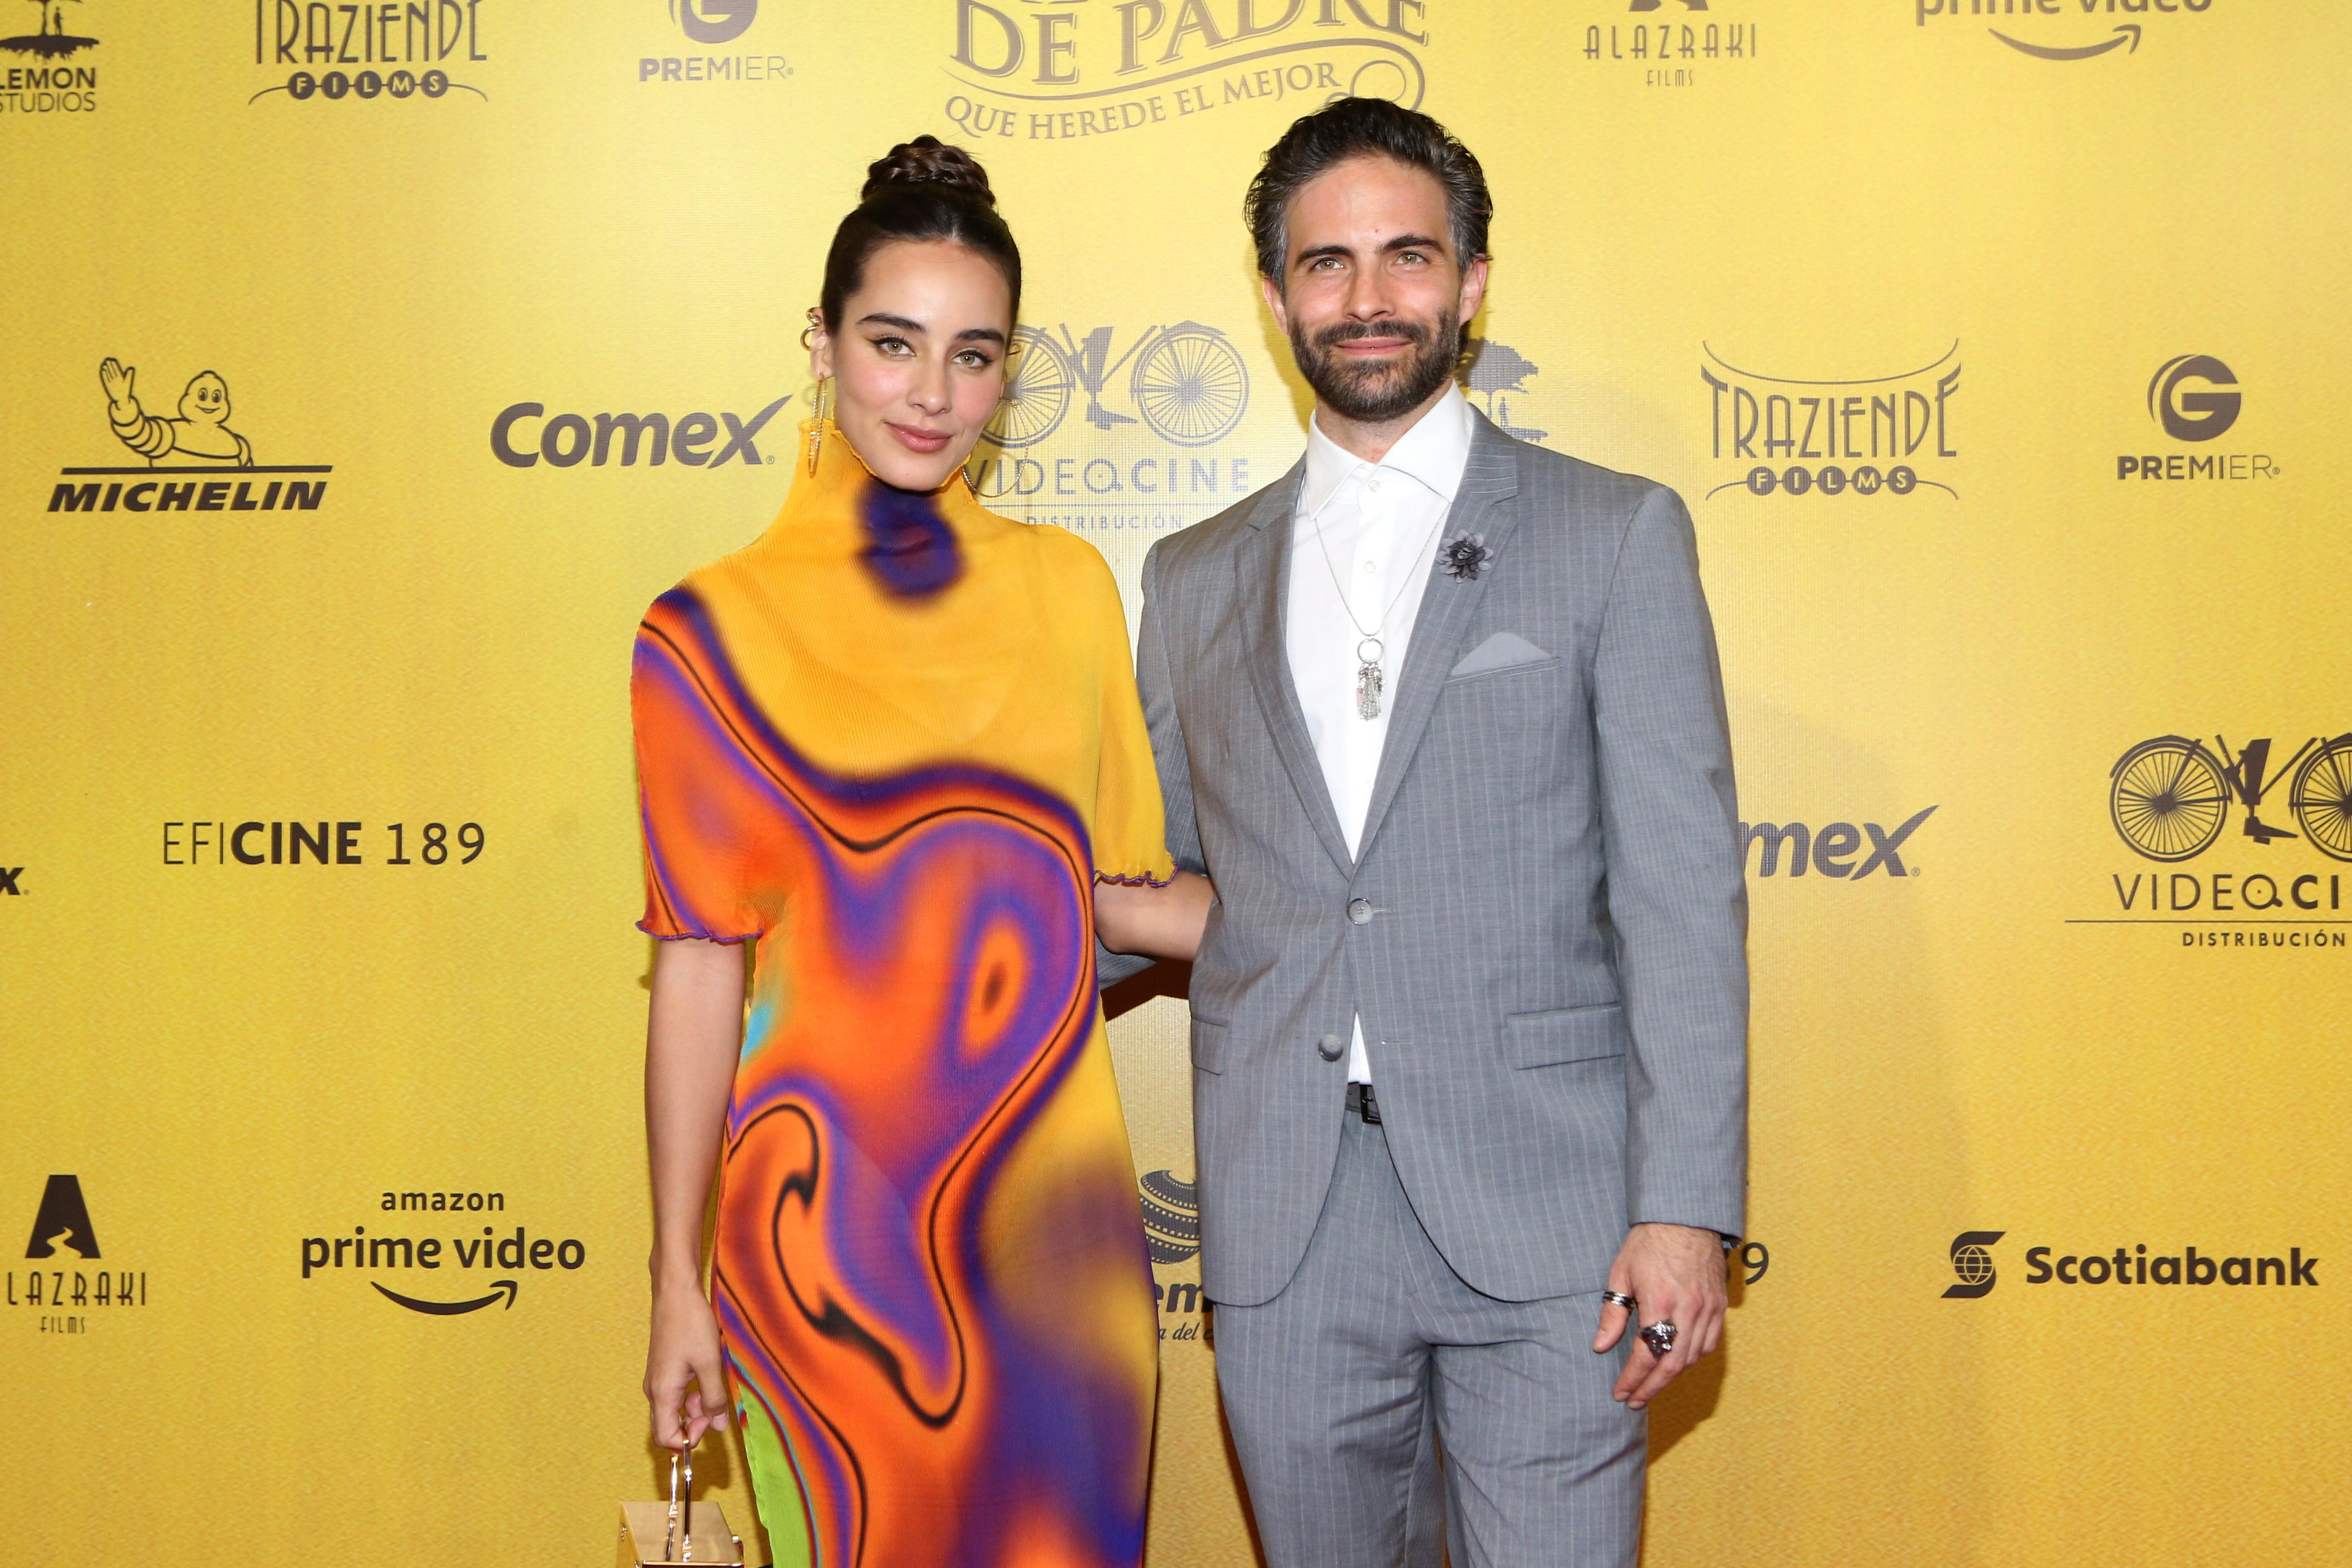 Esmeralda Pimentel y su novio Osvaldo Benavides premiere de Mentada de padre